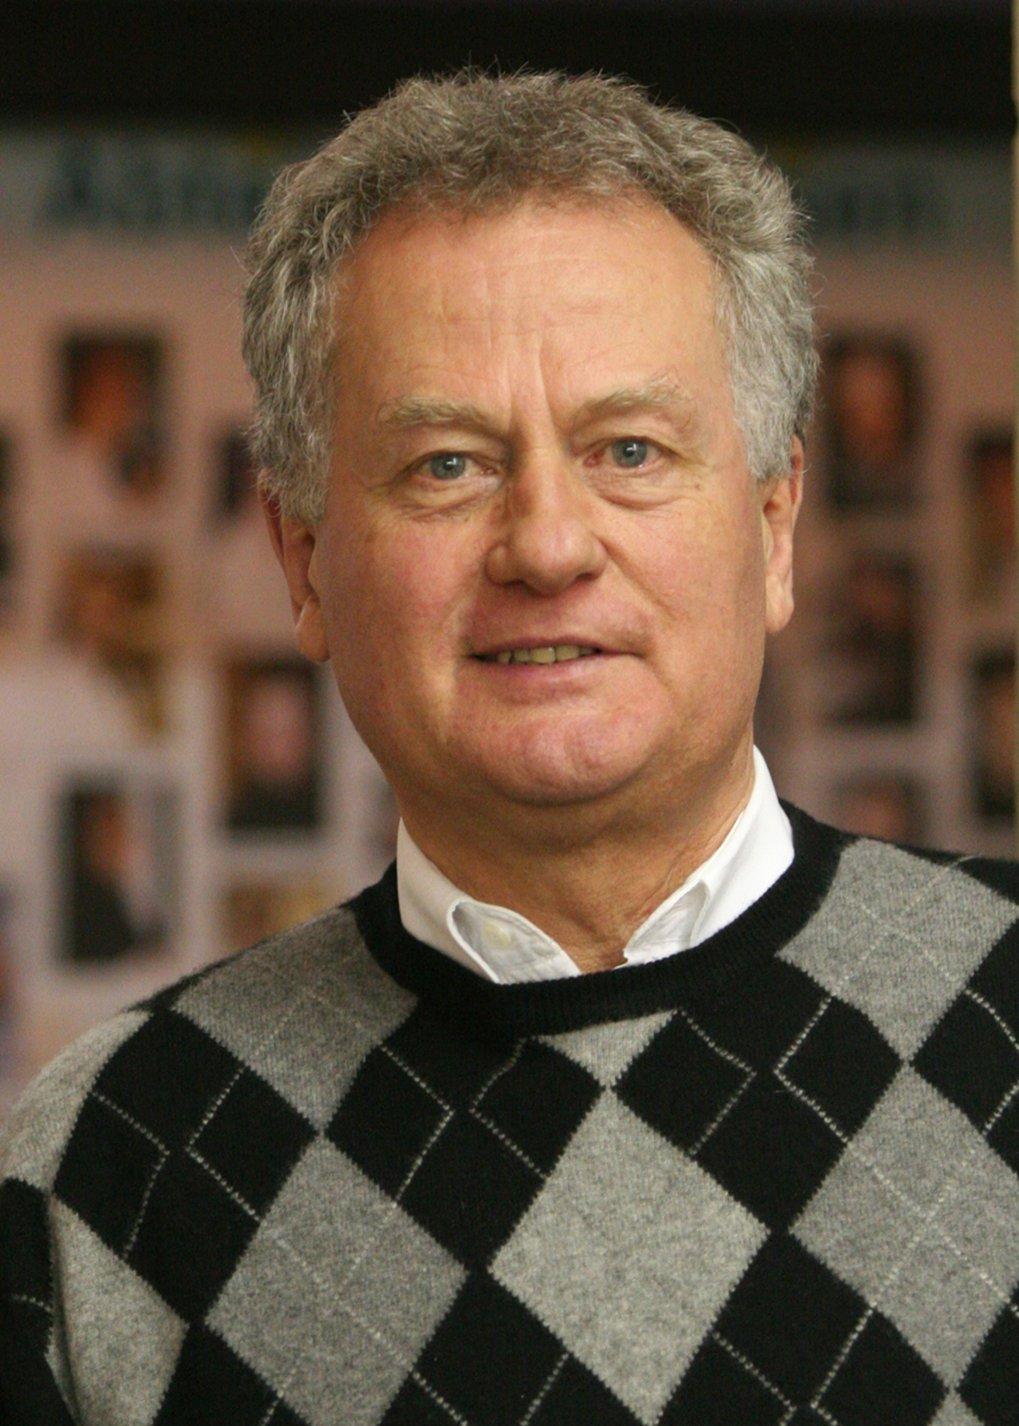 Prof. Dr. Dr. h.c. Martin Jansen